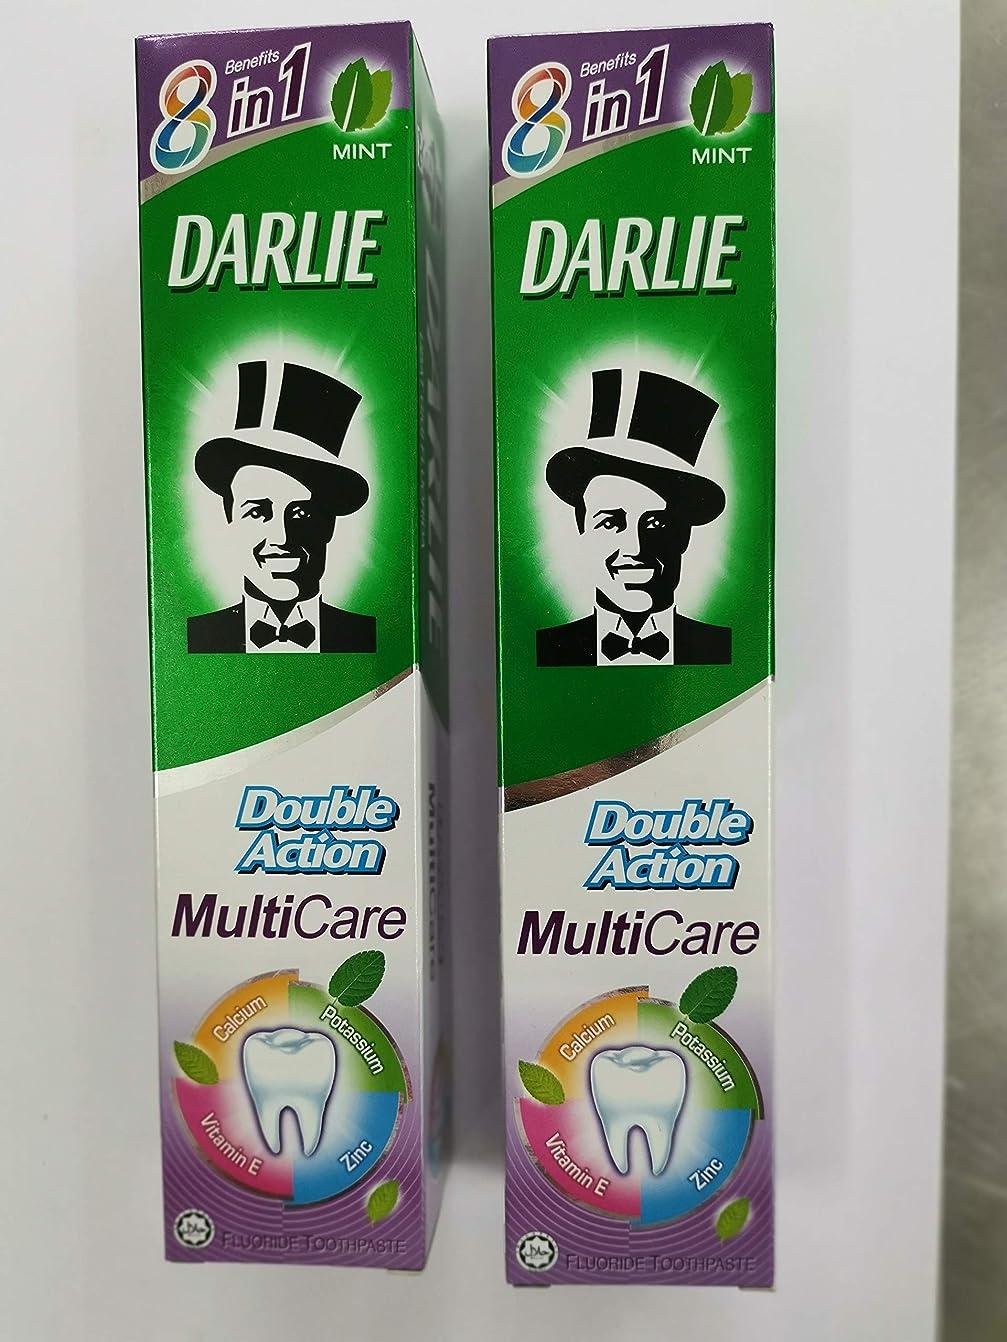 DARLIE 歯磨き粉ダブルアクションマルチケア 180g x 2-空洞を飛行し、歯を強化するフッ化物が含まれています